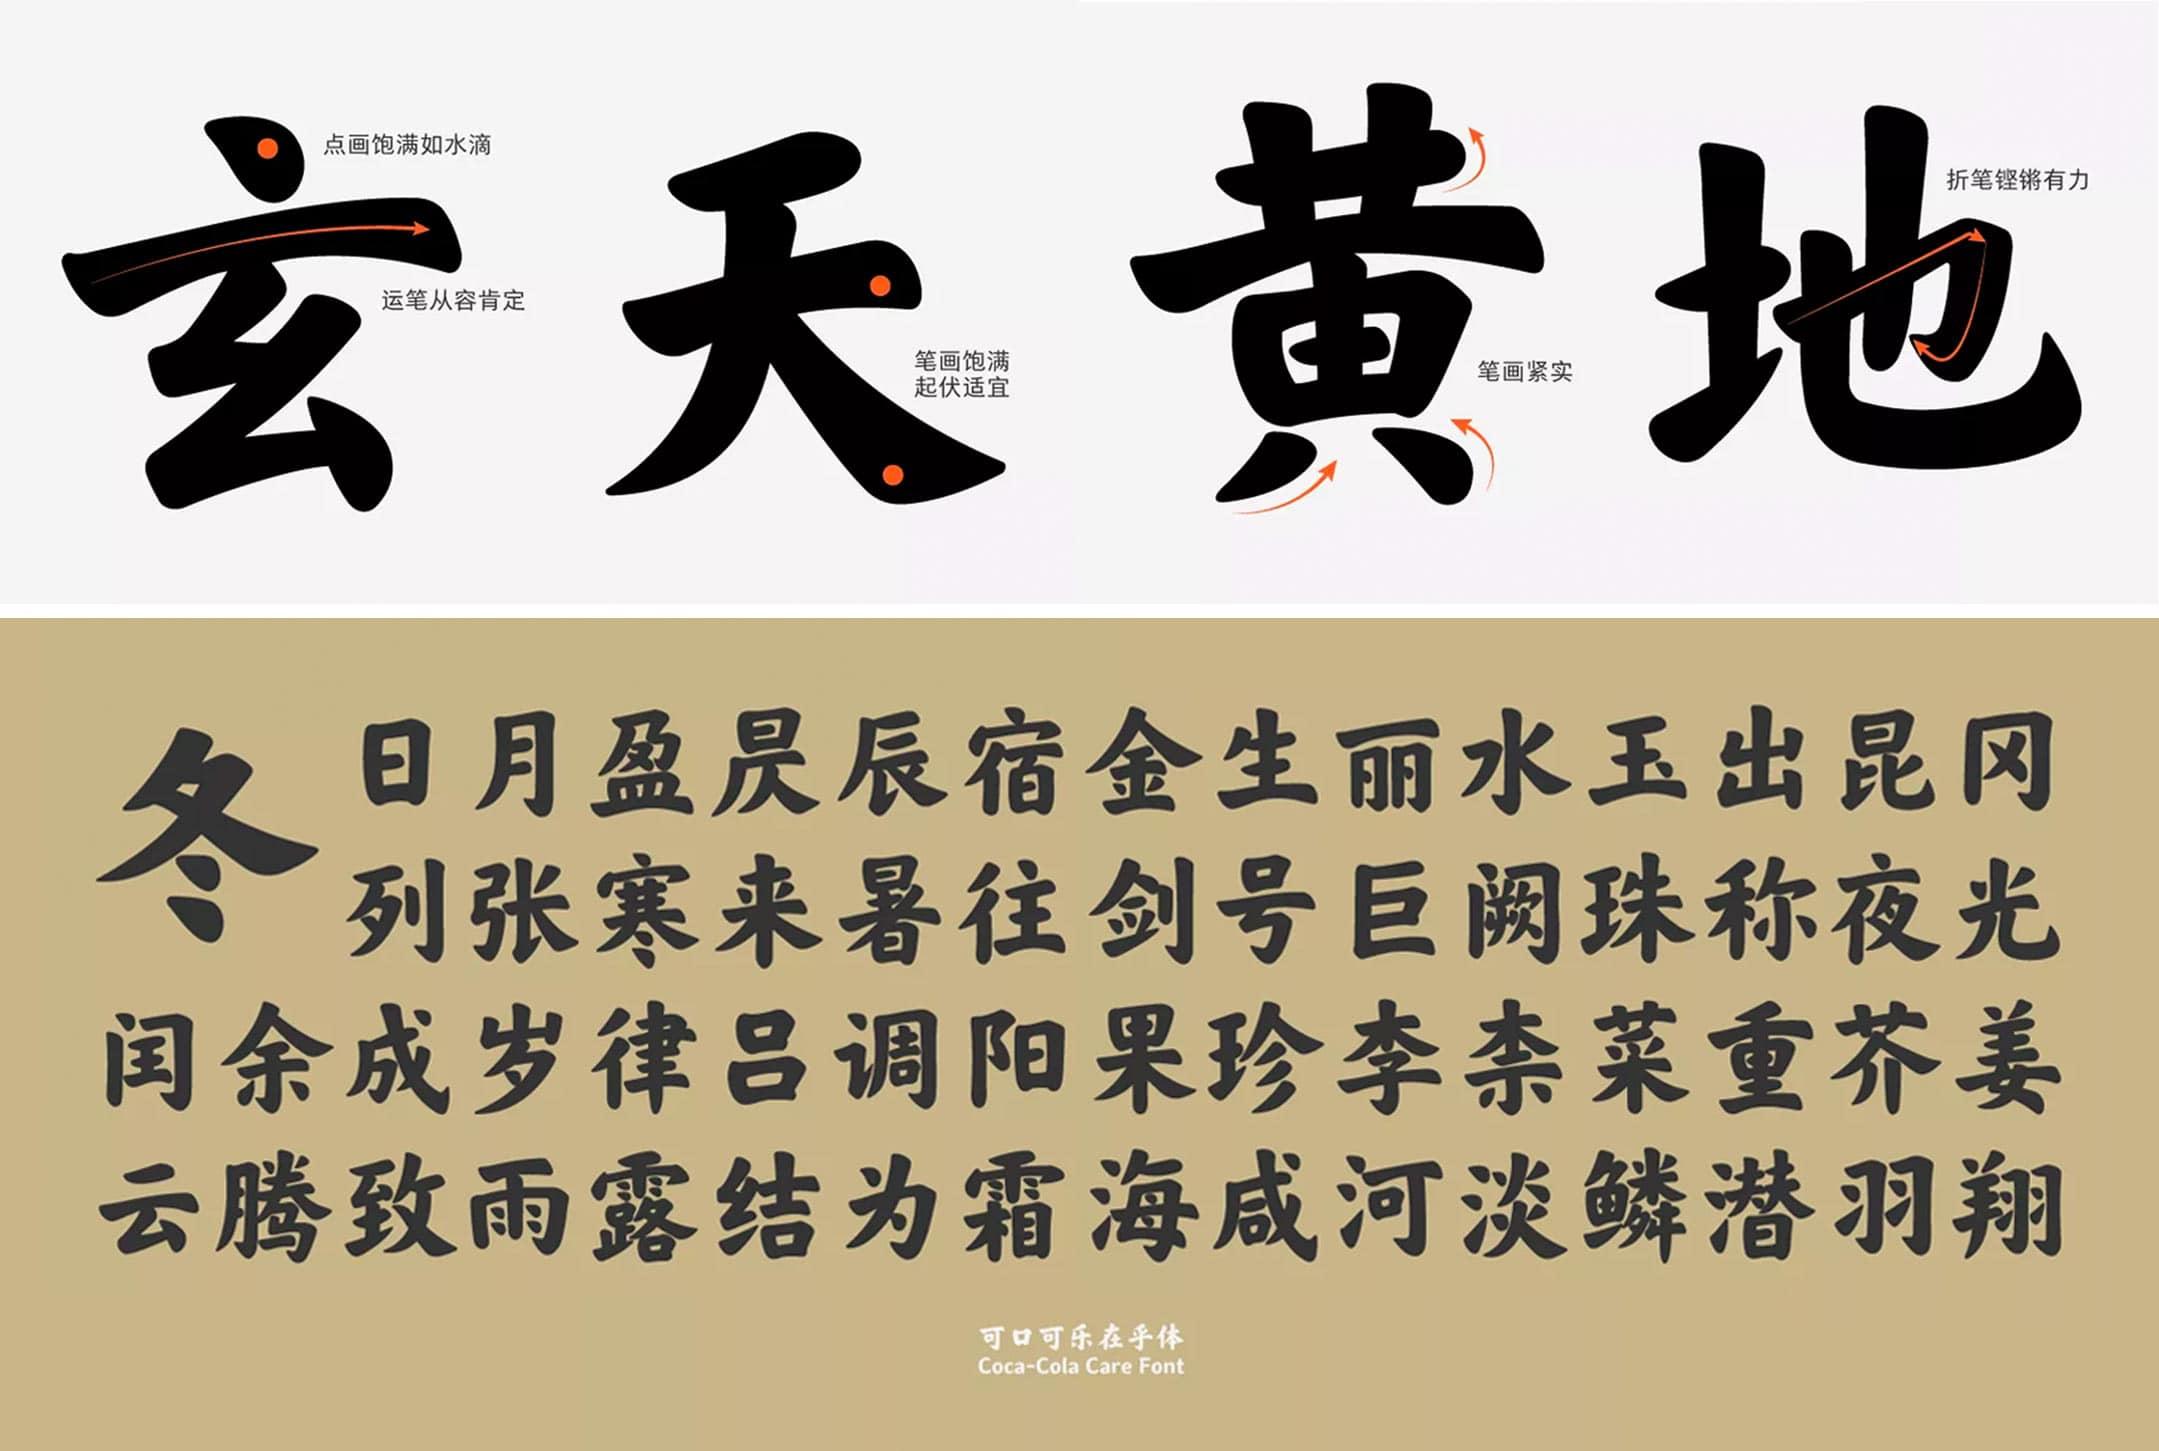 https://cdn1.zijia.com.cn/Public/Uploads/mainsort/mainsort_1588935356_7797.jpg